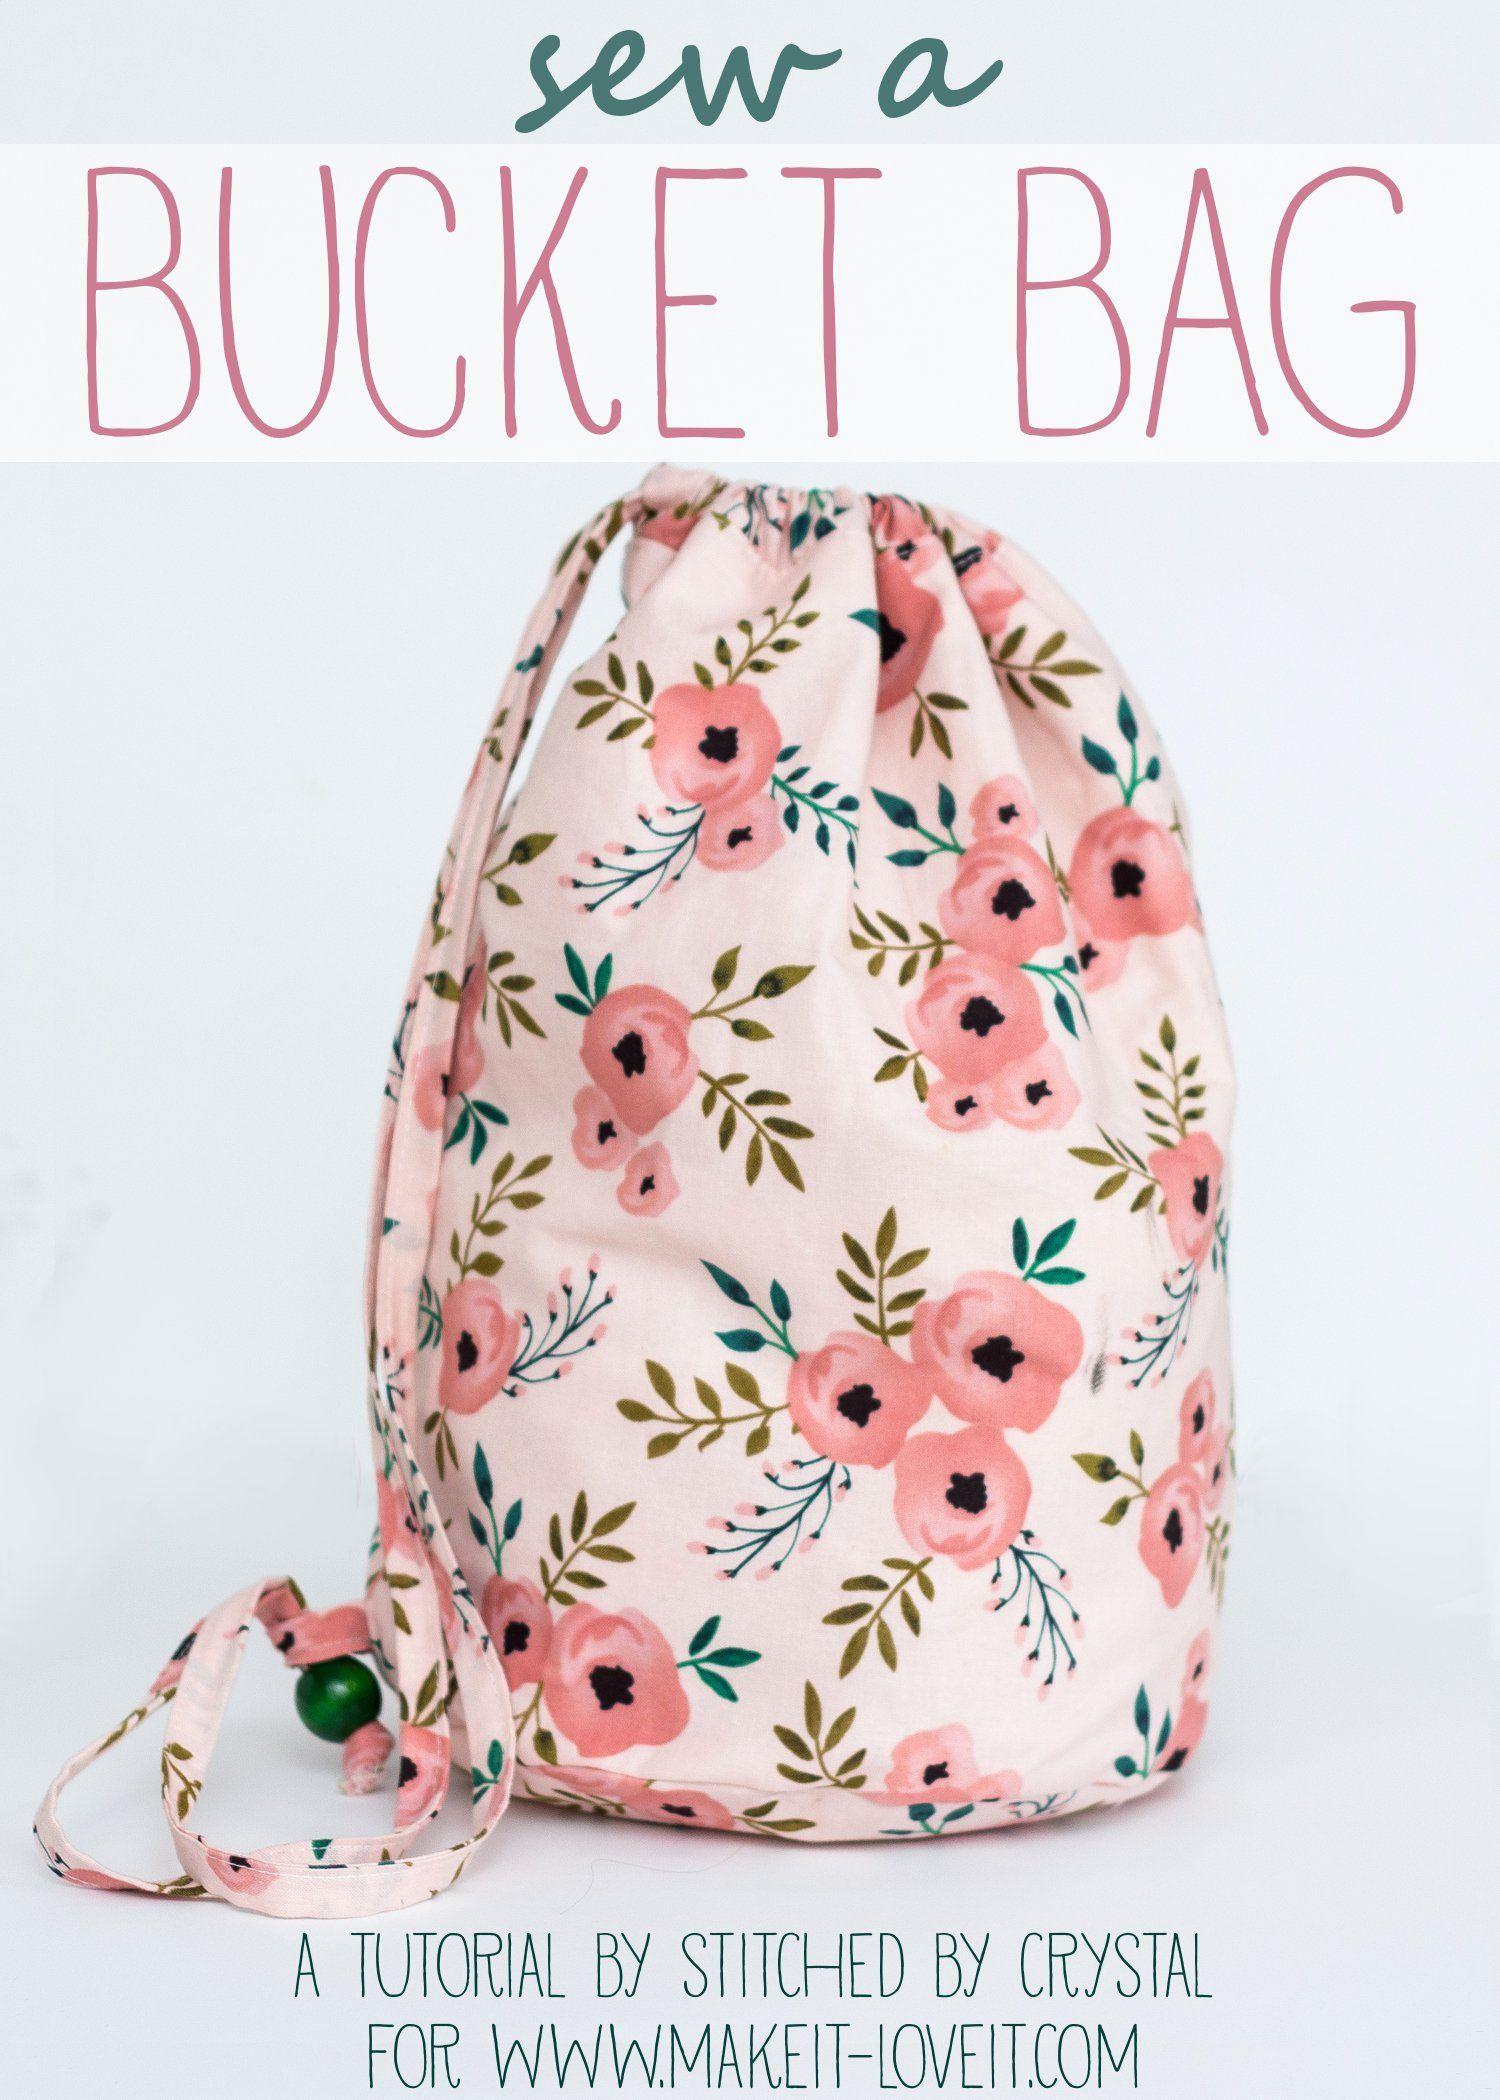 Sew a Bucket Bag | Nähen anfänger, Diy nähen und Nähen